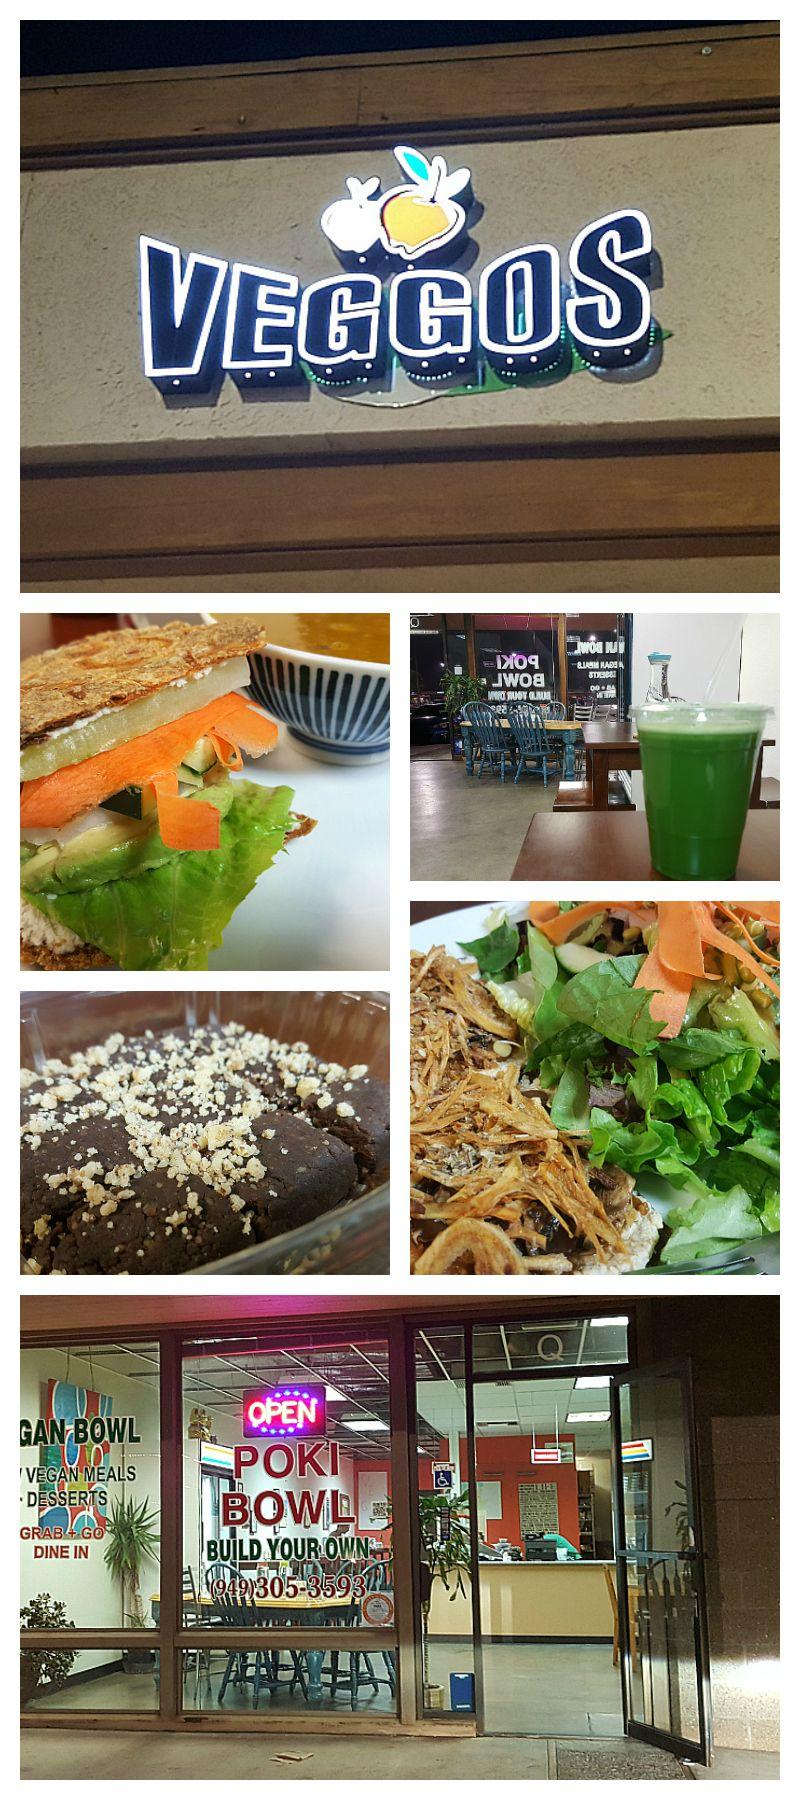 Veggos Vegan Raw Food Restaurant In Lake Forest California